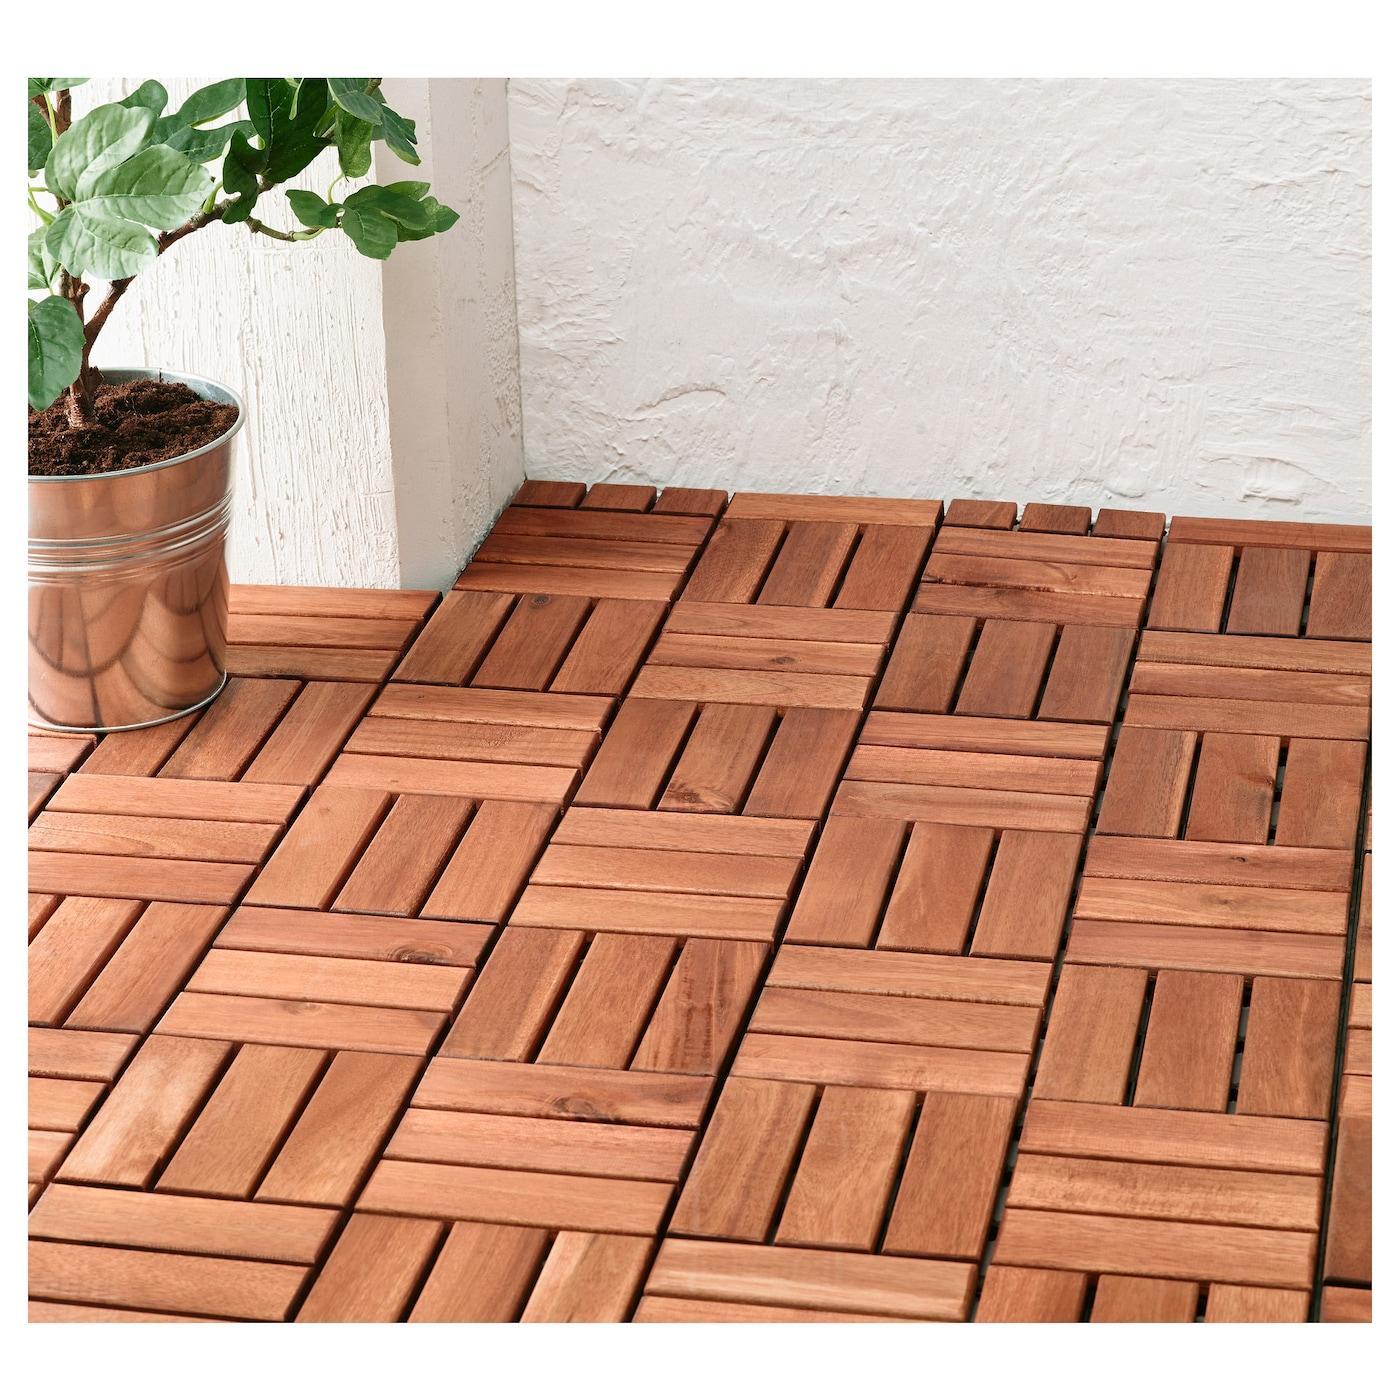 runnen floor decking outdoor brown stained m ikea. Black Bedroom Furniture Sets. Home Design Ideas